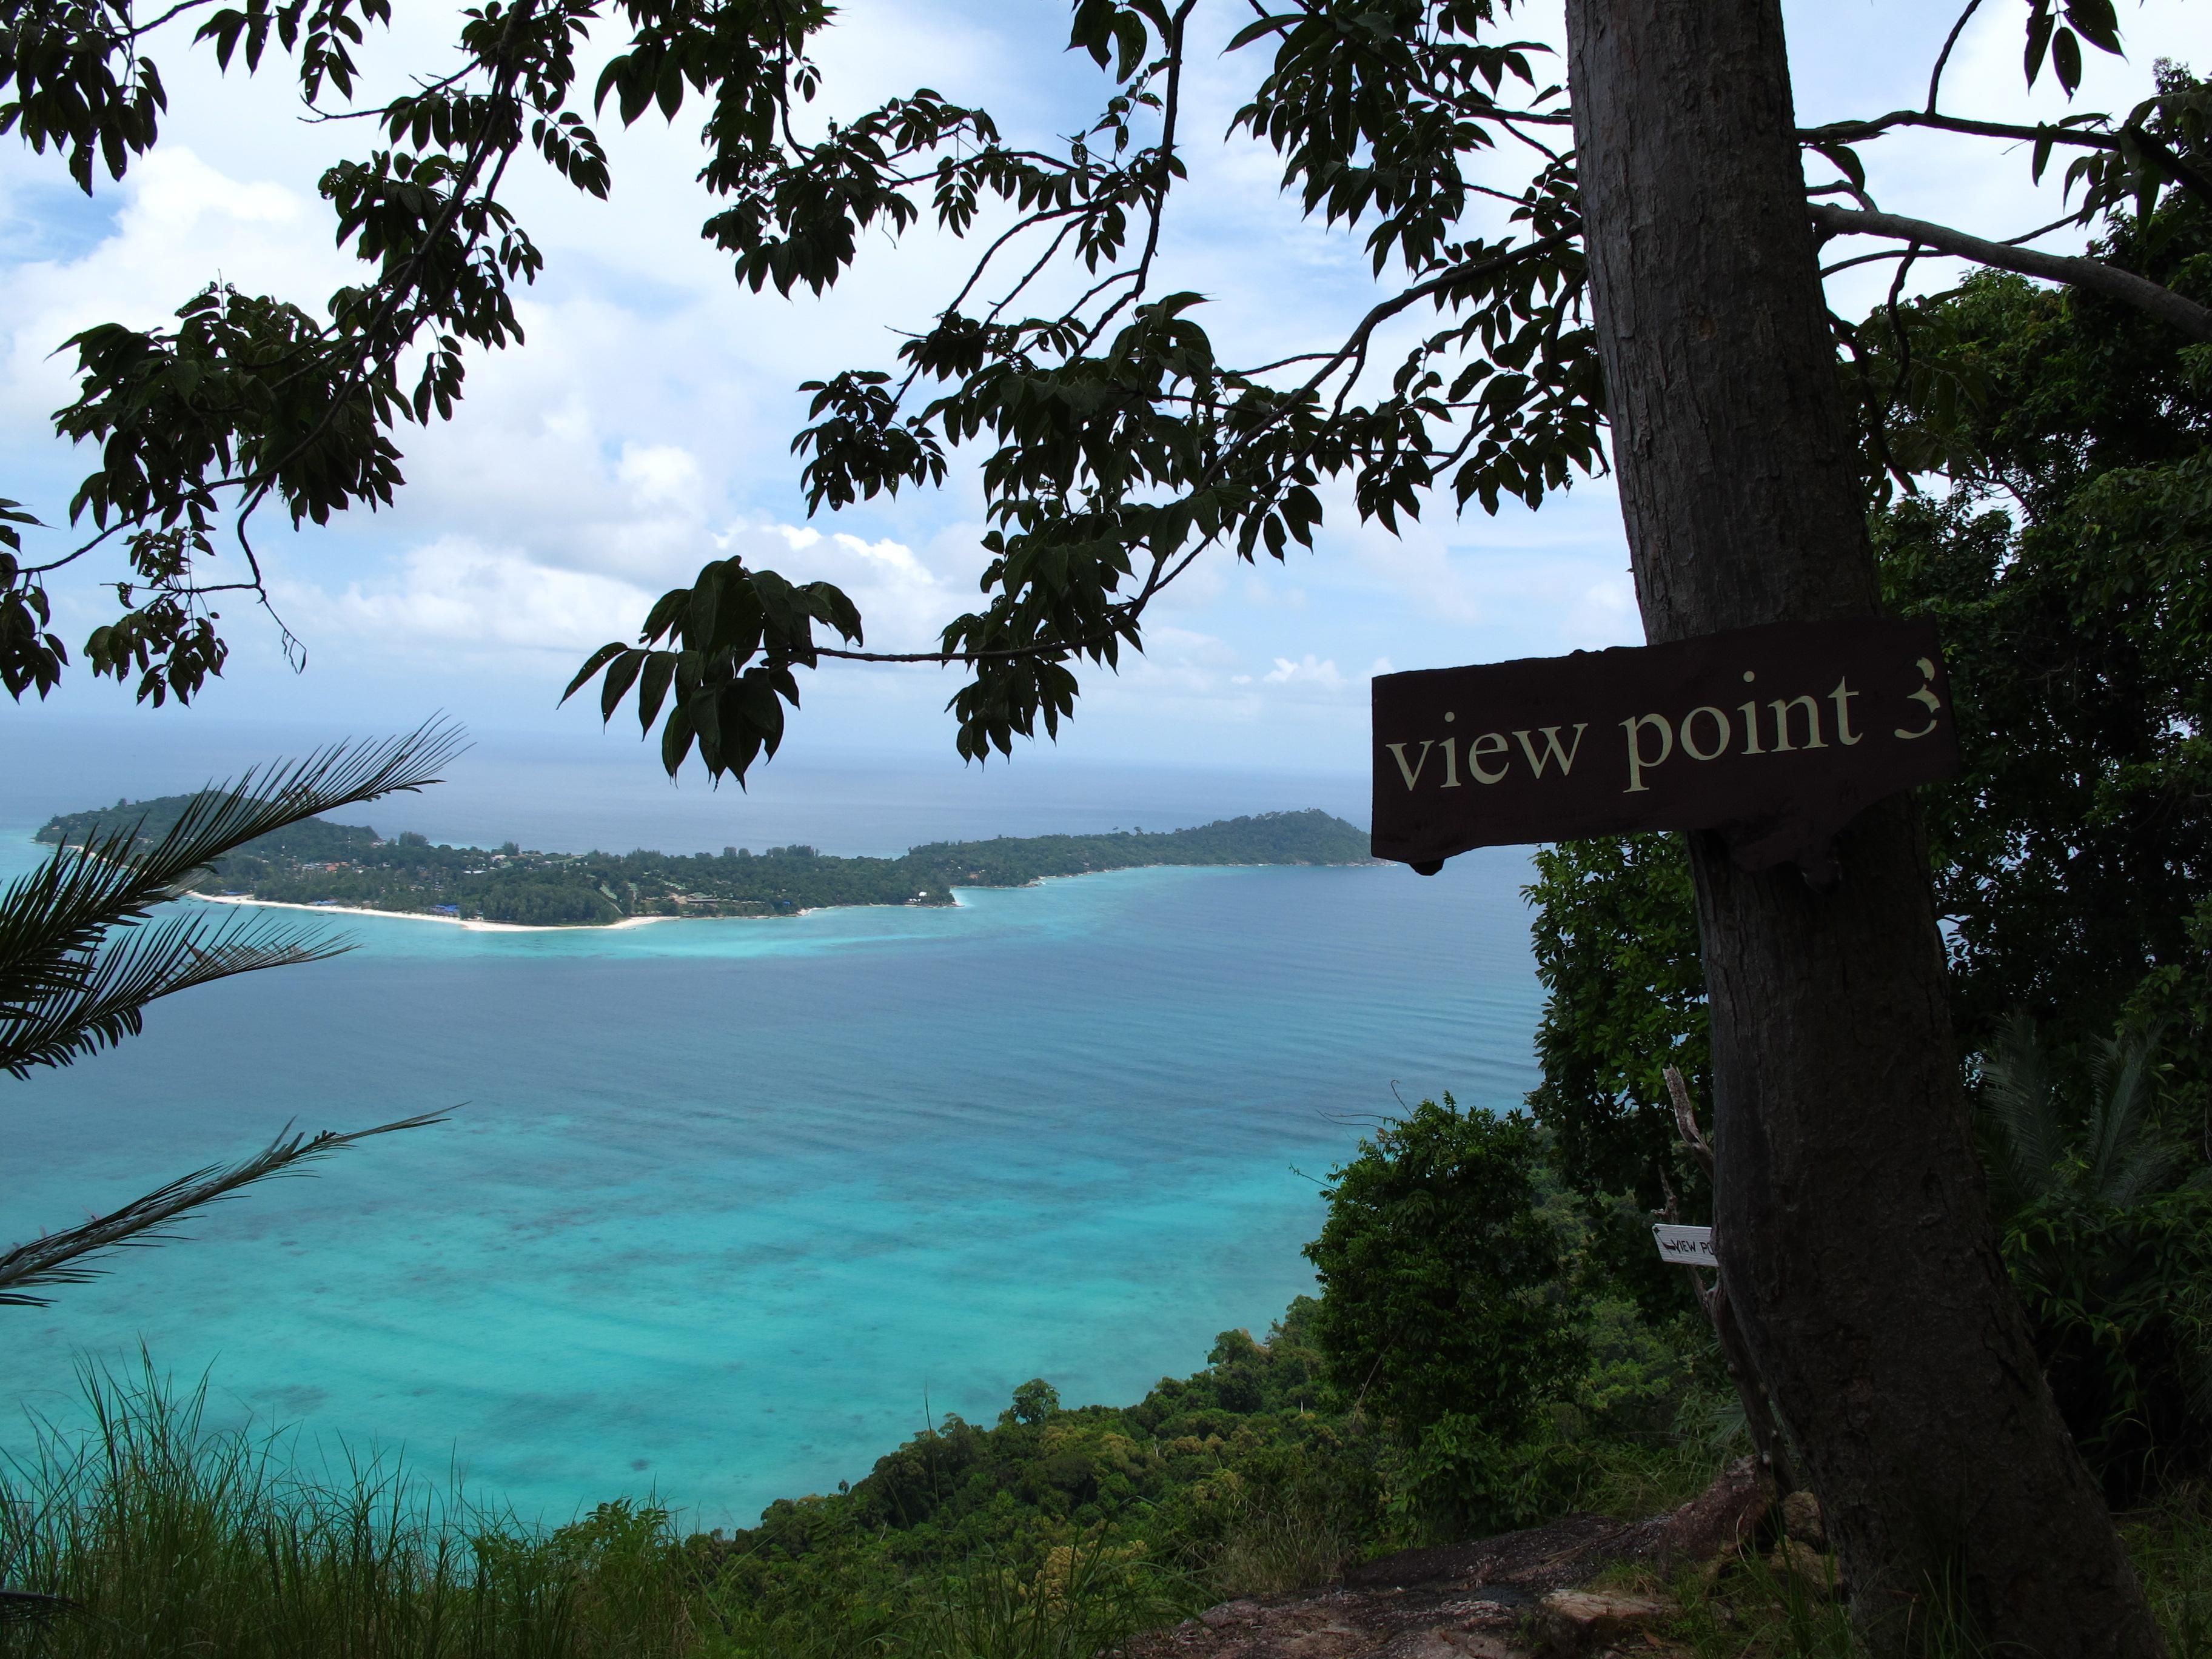 Ko Lipe Diving - Trip to Adang viewpoint